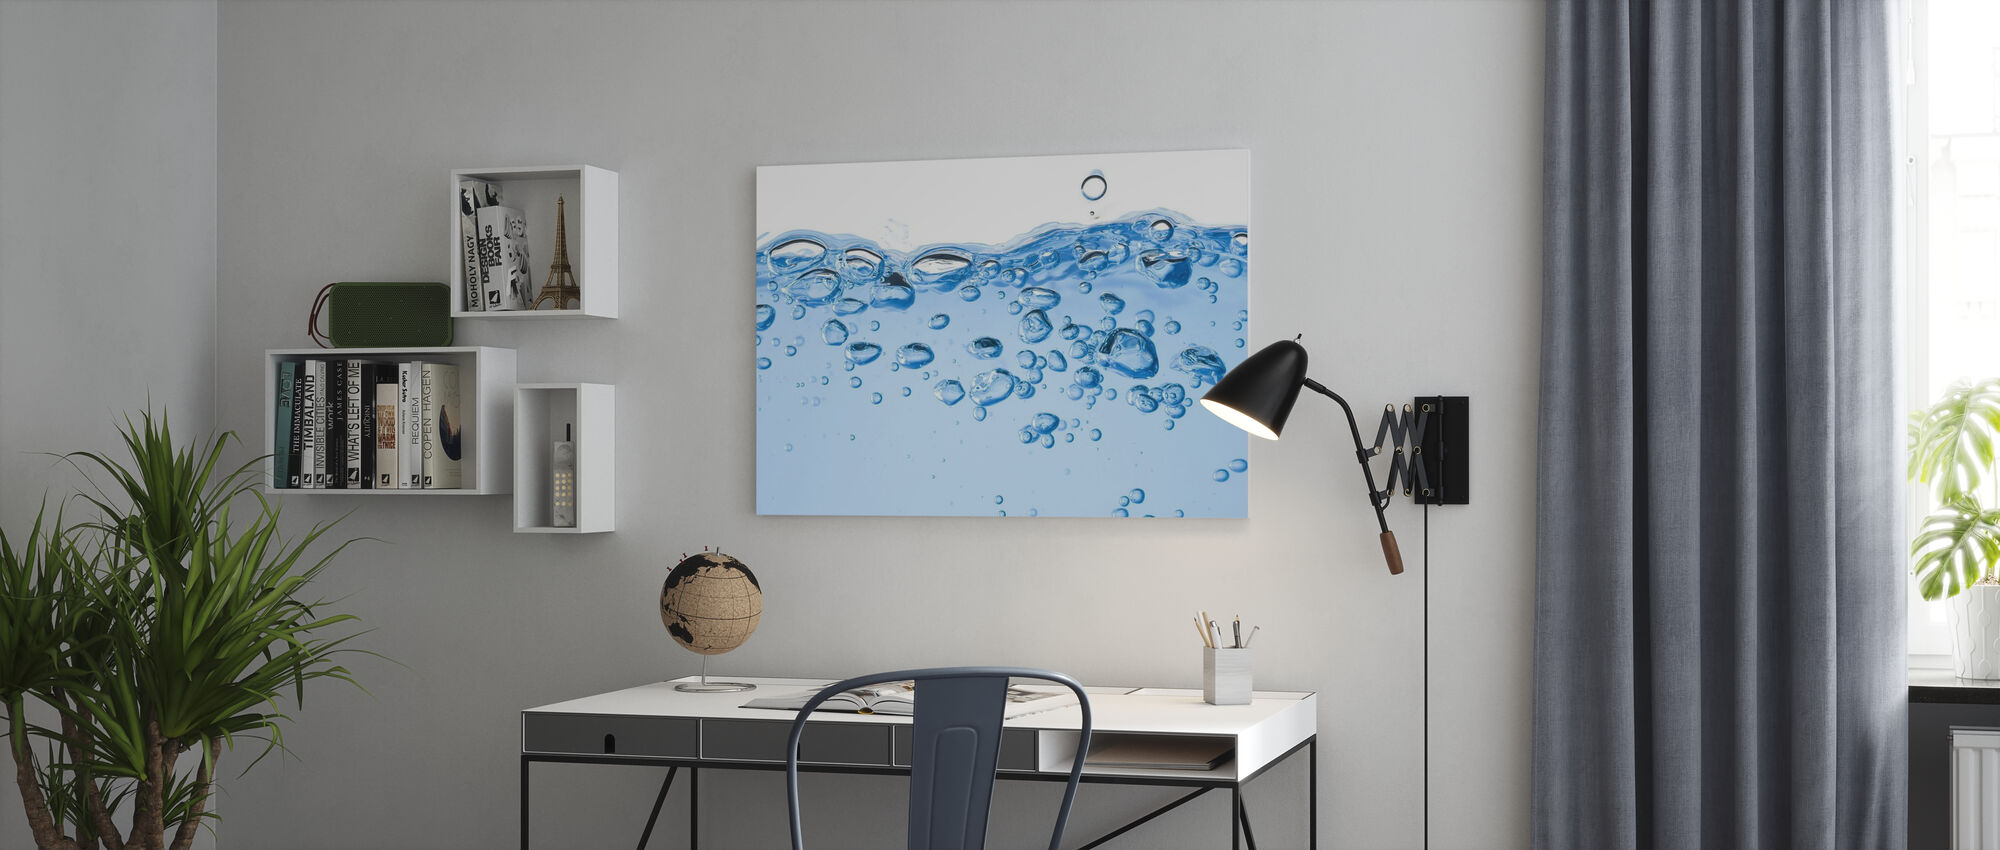 Splashing Water - Canvas print - Office